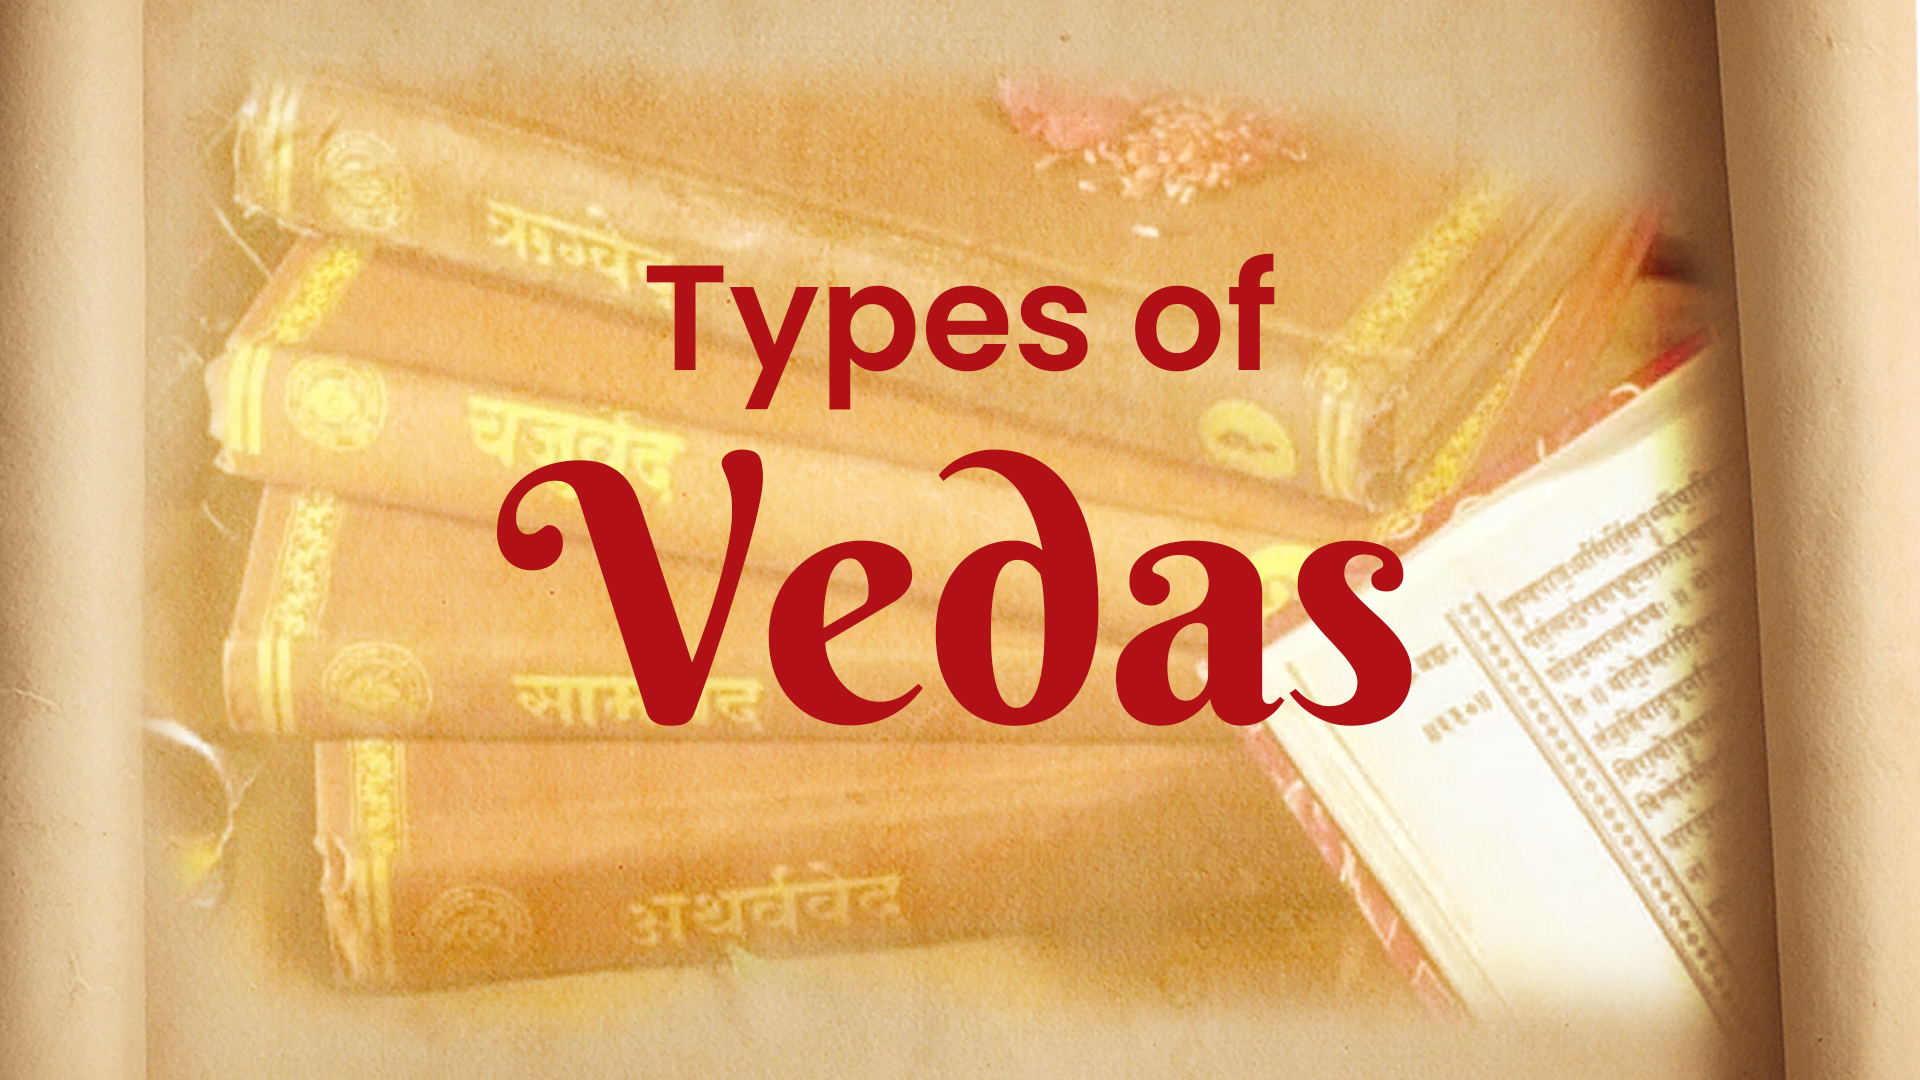 types of vedas